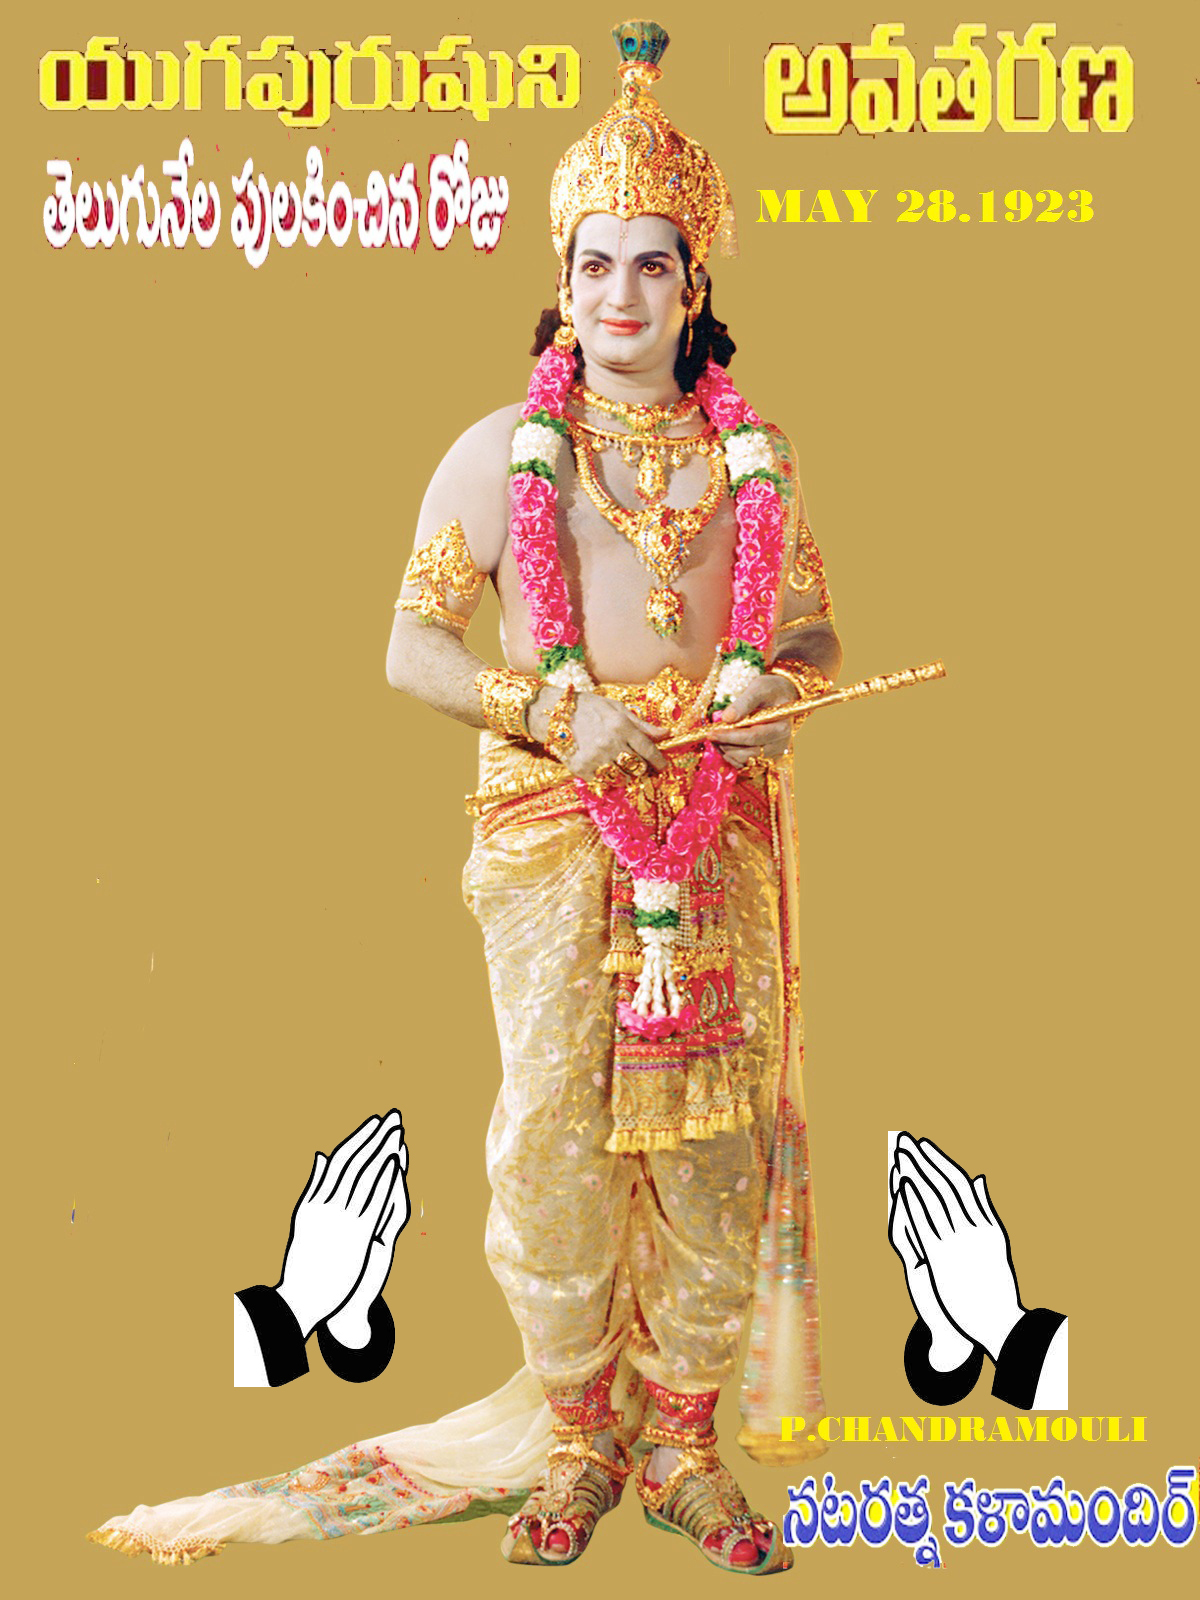 Bhagavad Gita Wallpapers Telugu Quotes Legend Ntr Sri Krishna Hd Image Nataratnakalamandir